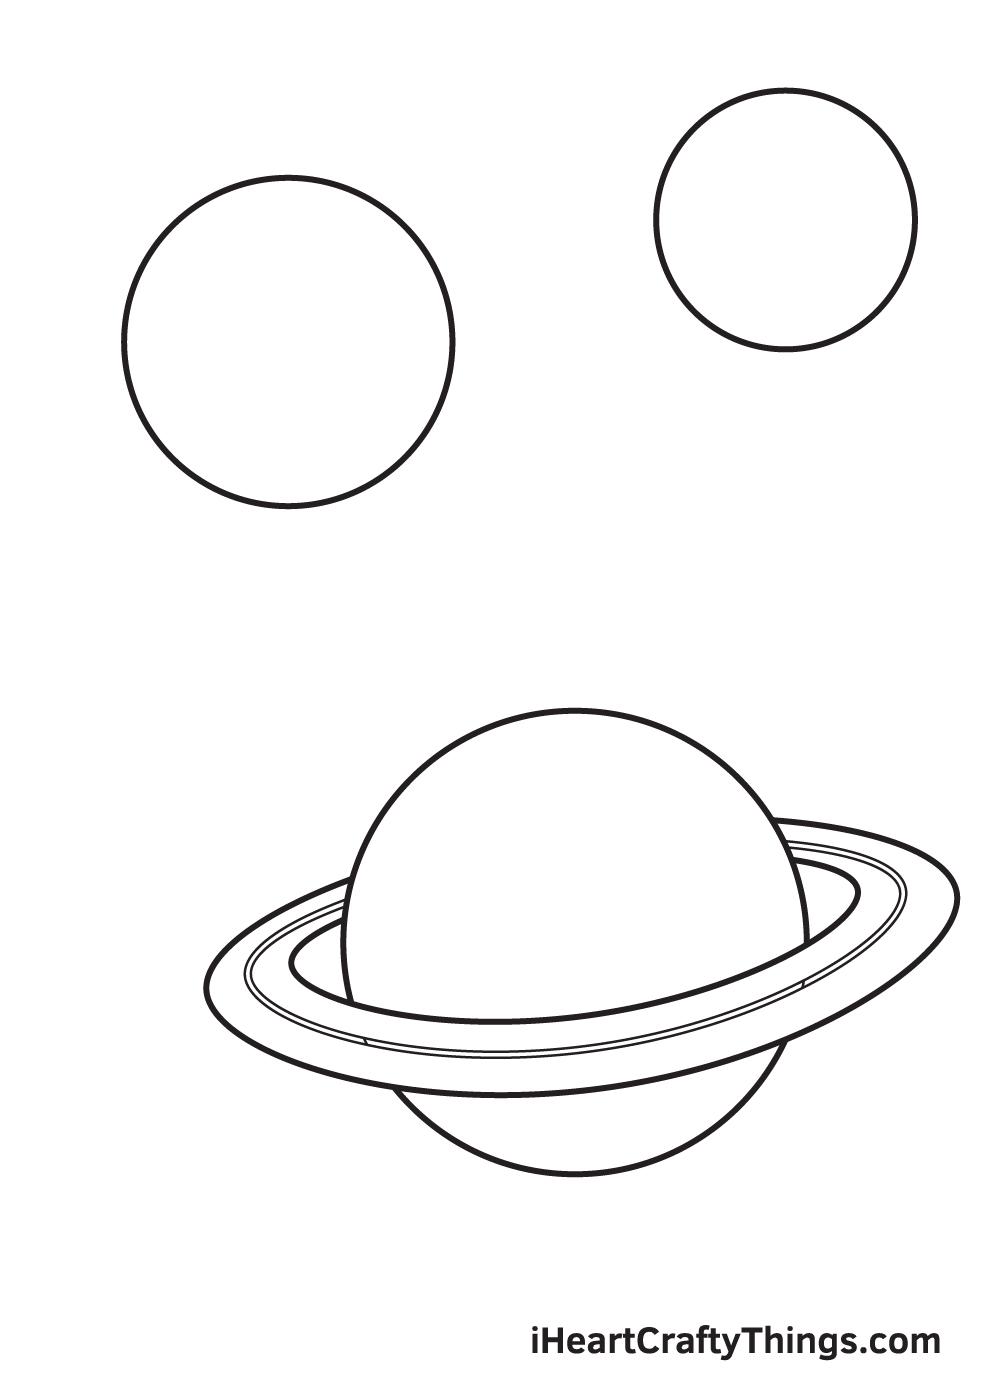 galaxy drawing - step 4